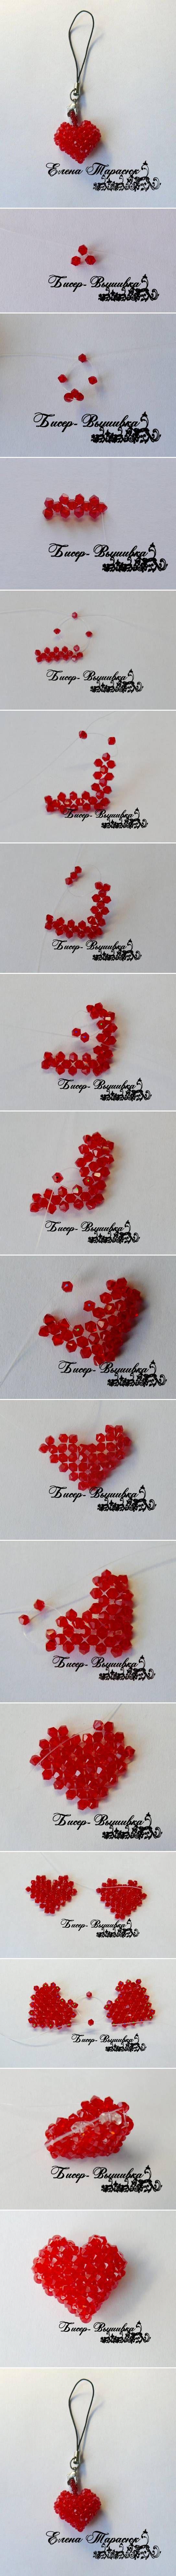 DIY Beads Heart Ornament DIY Beads Heart Ornament